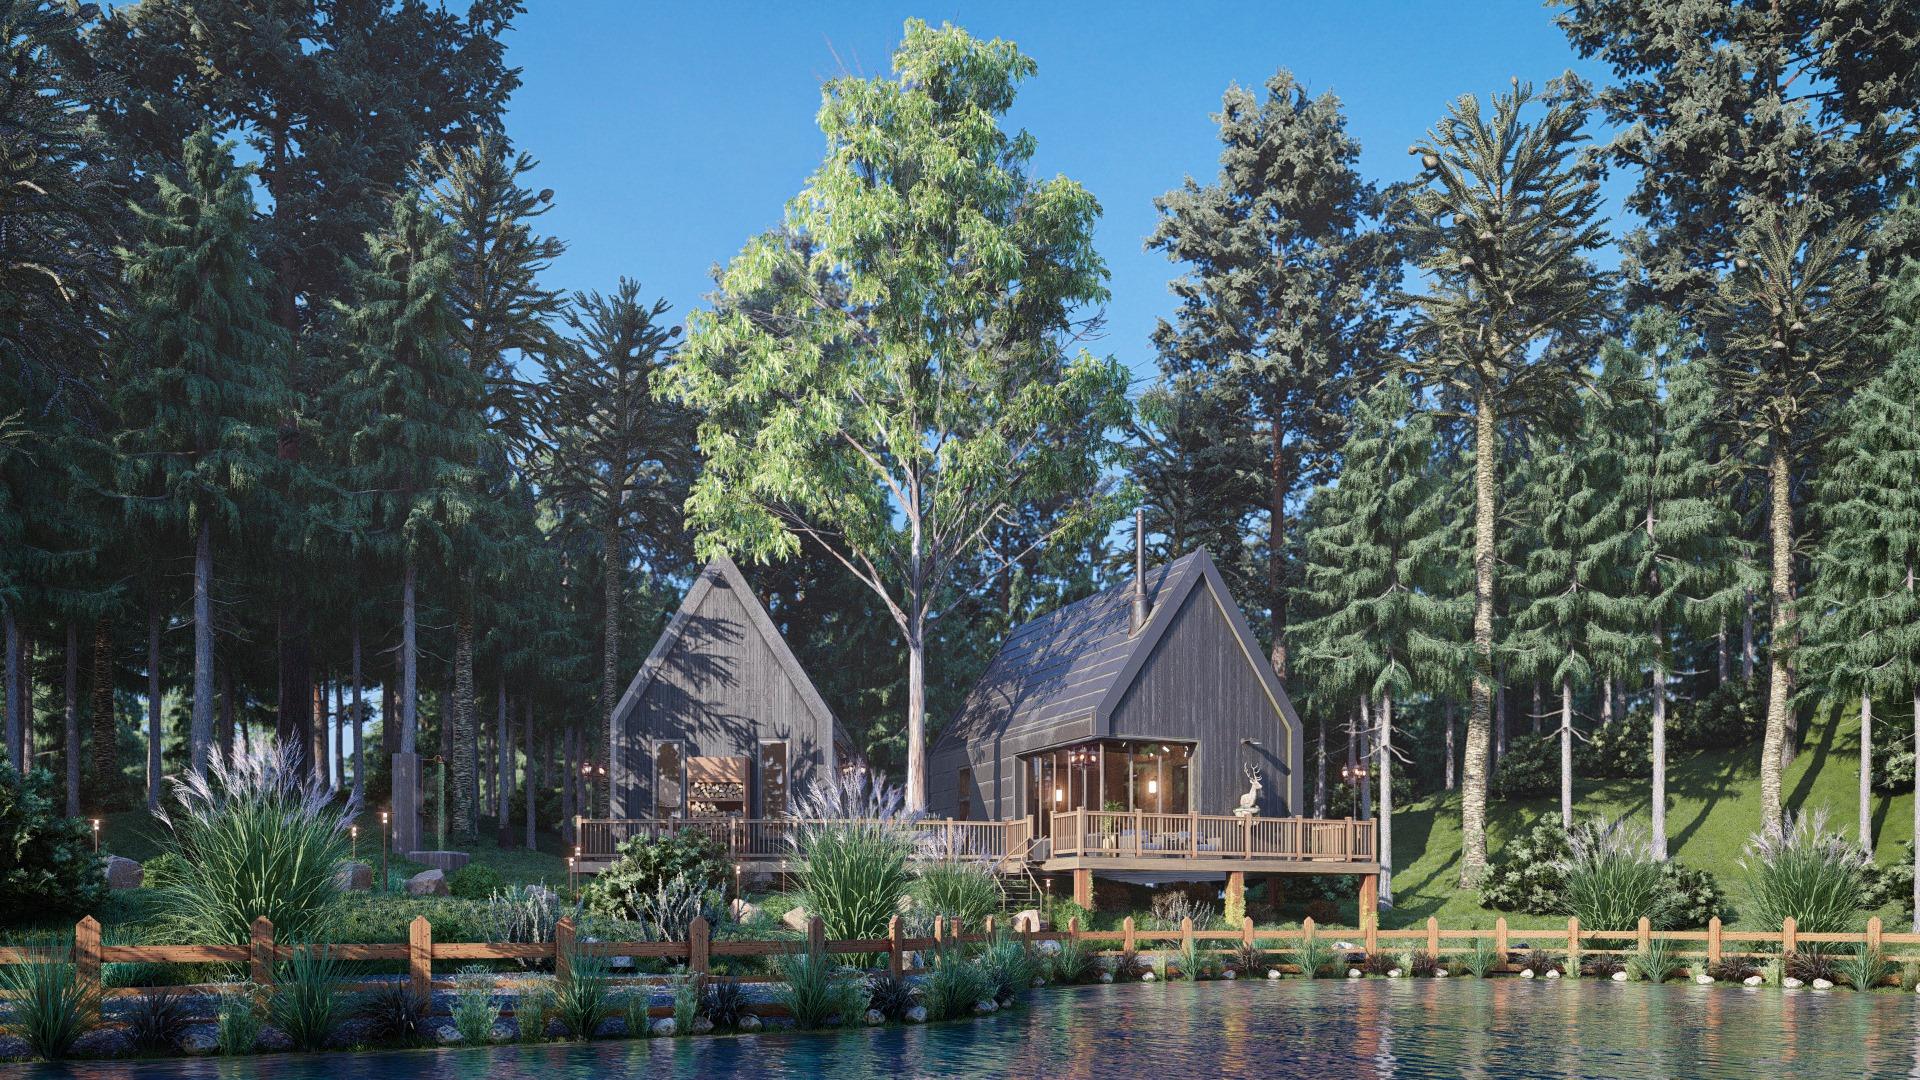 Cabina sul lago, resa in Lumion da Arsalan Mohaghegh Honarvar di Honarvar Design Studio.